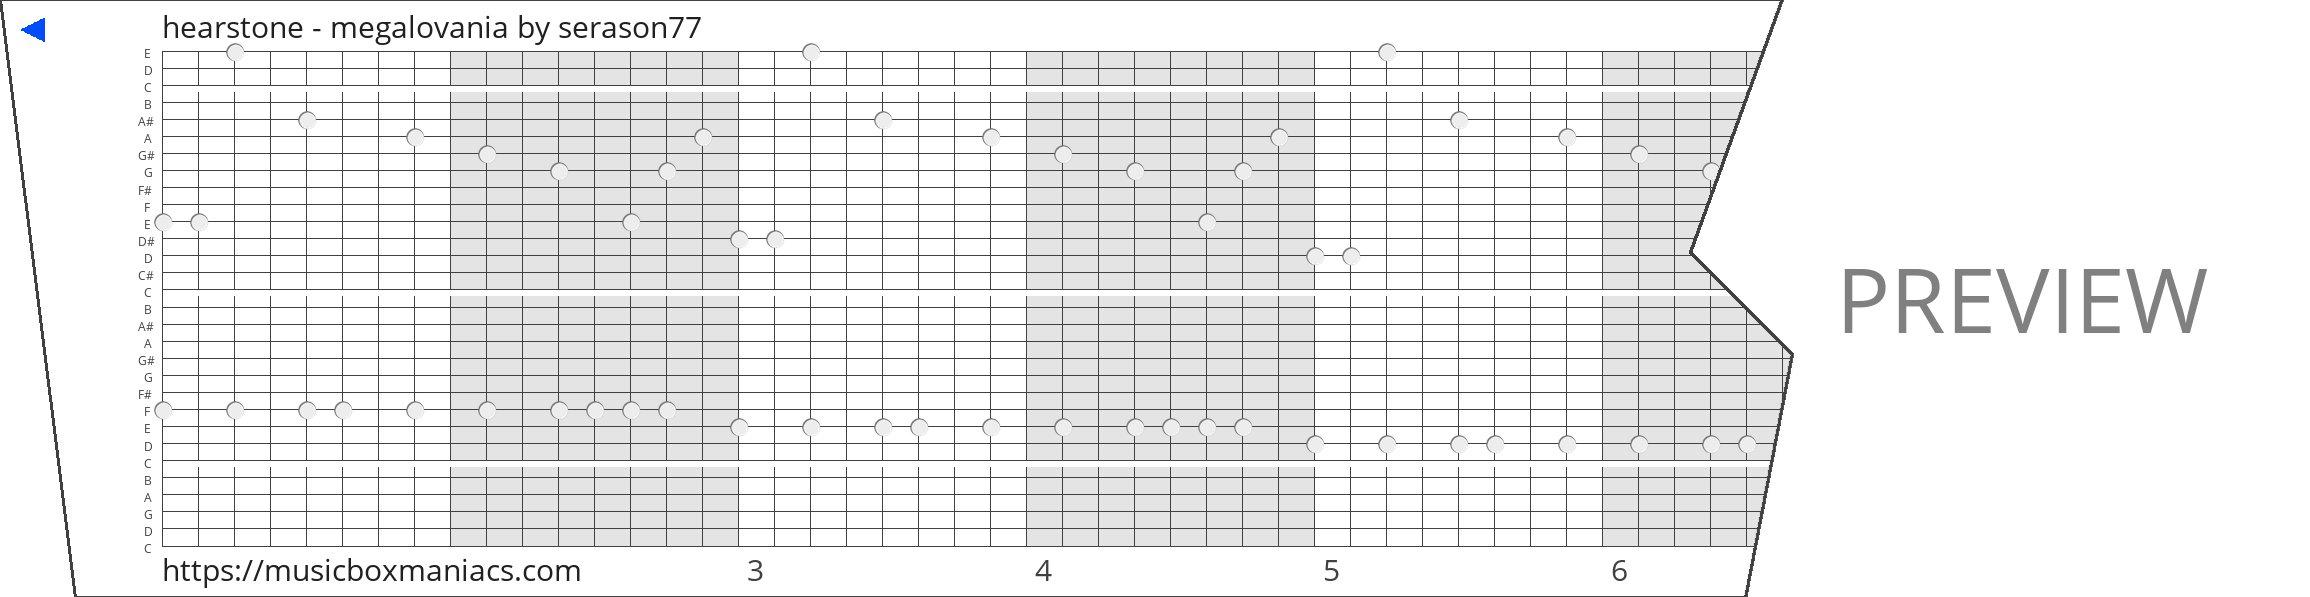 hearstone - megalovania 30 note music box paper strip